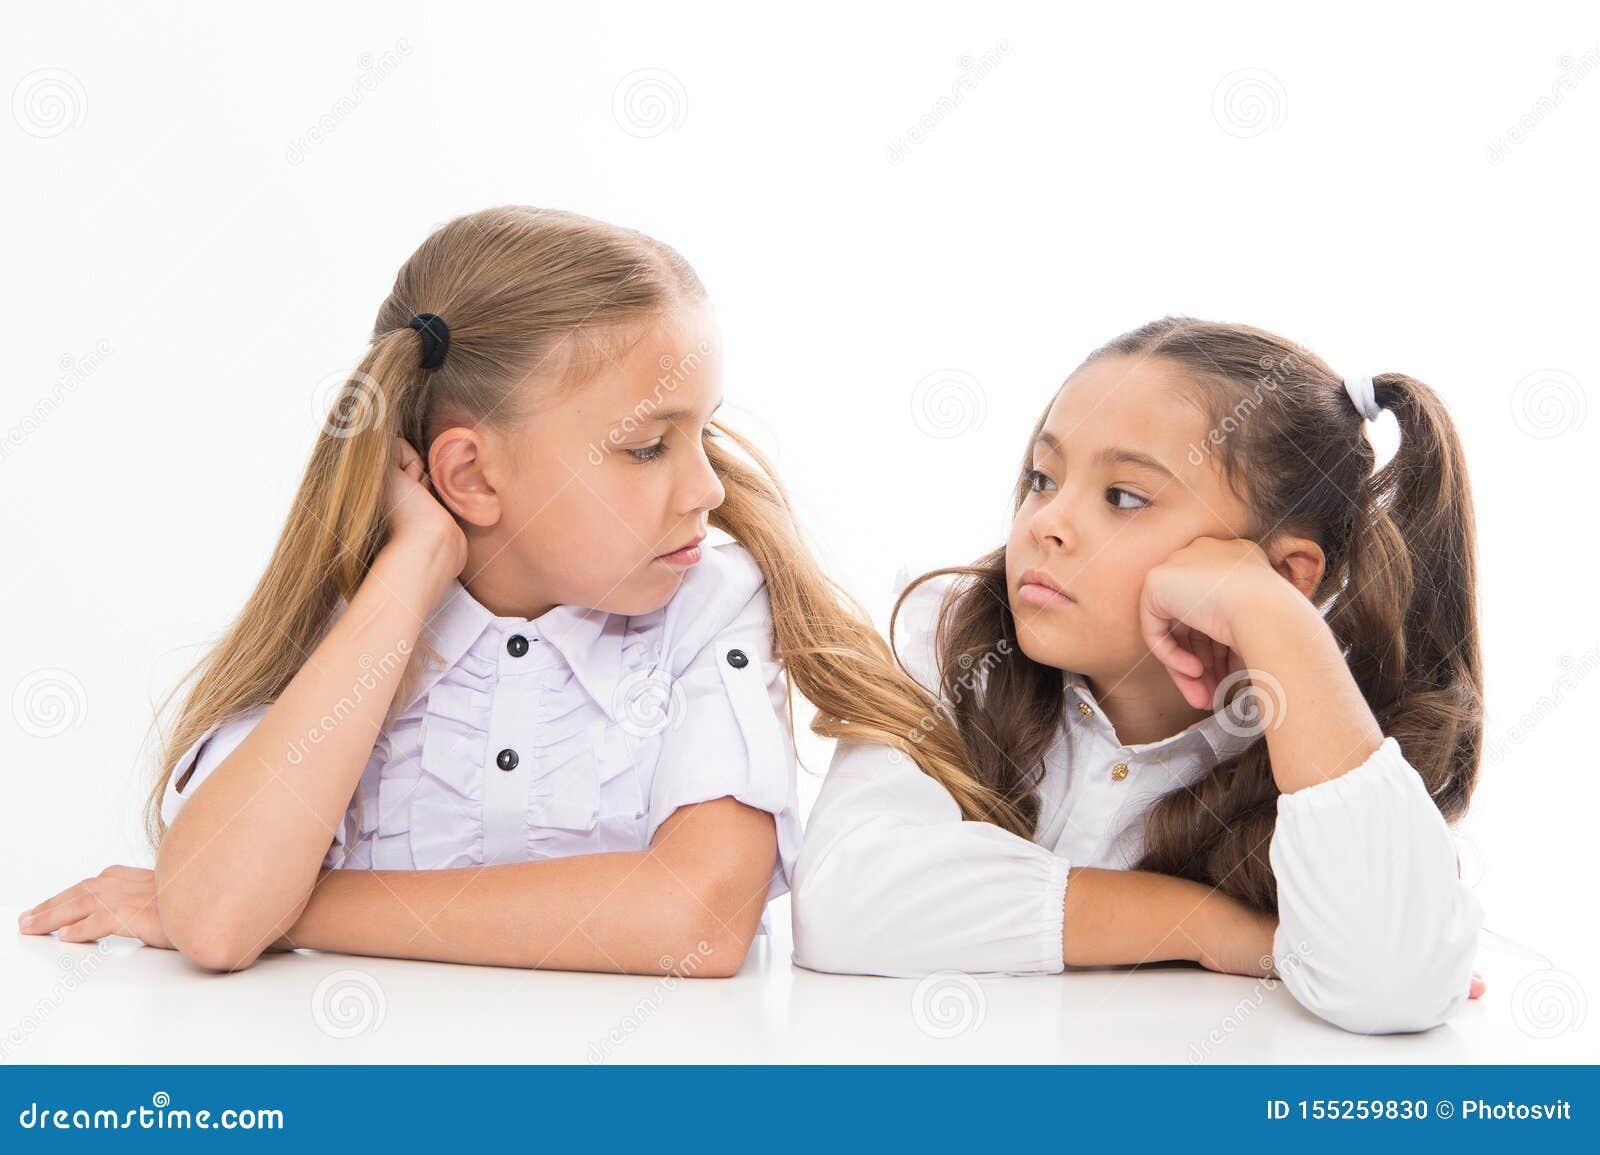 Adorable schoolgirls. Formal style. Happy childhood. Schoolgirls sit at desk white background. Schoolgirls emotional